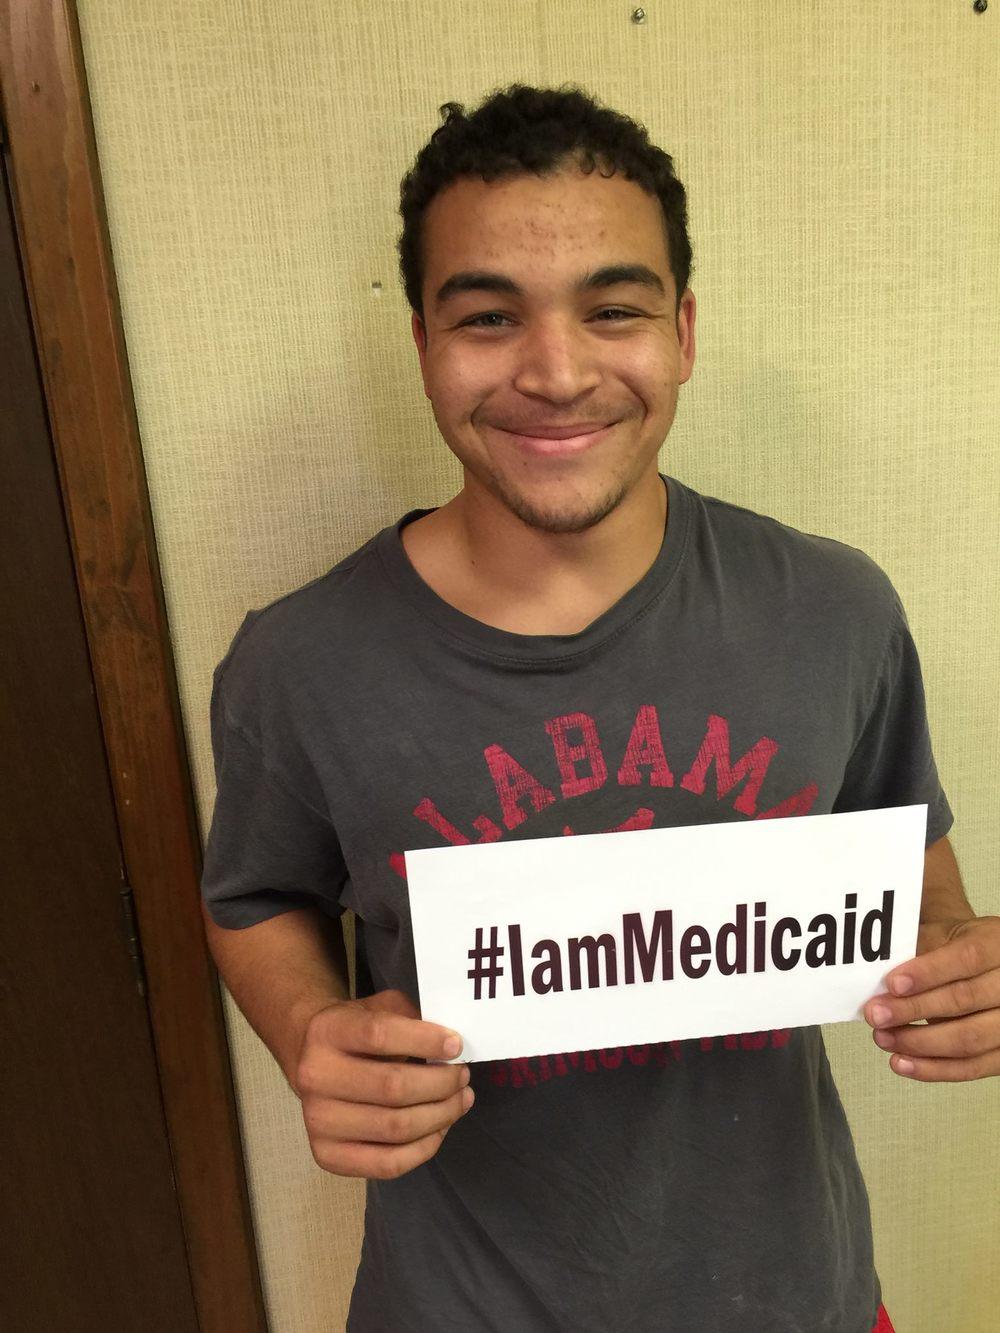 I am a great football player. Last year I had ablation for cardiac arrhythmia. Thanks Children's Hospital. #IamMedicaid